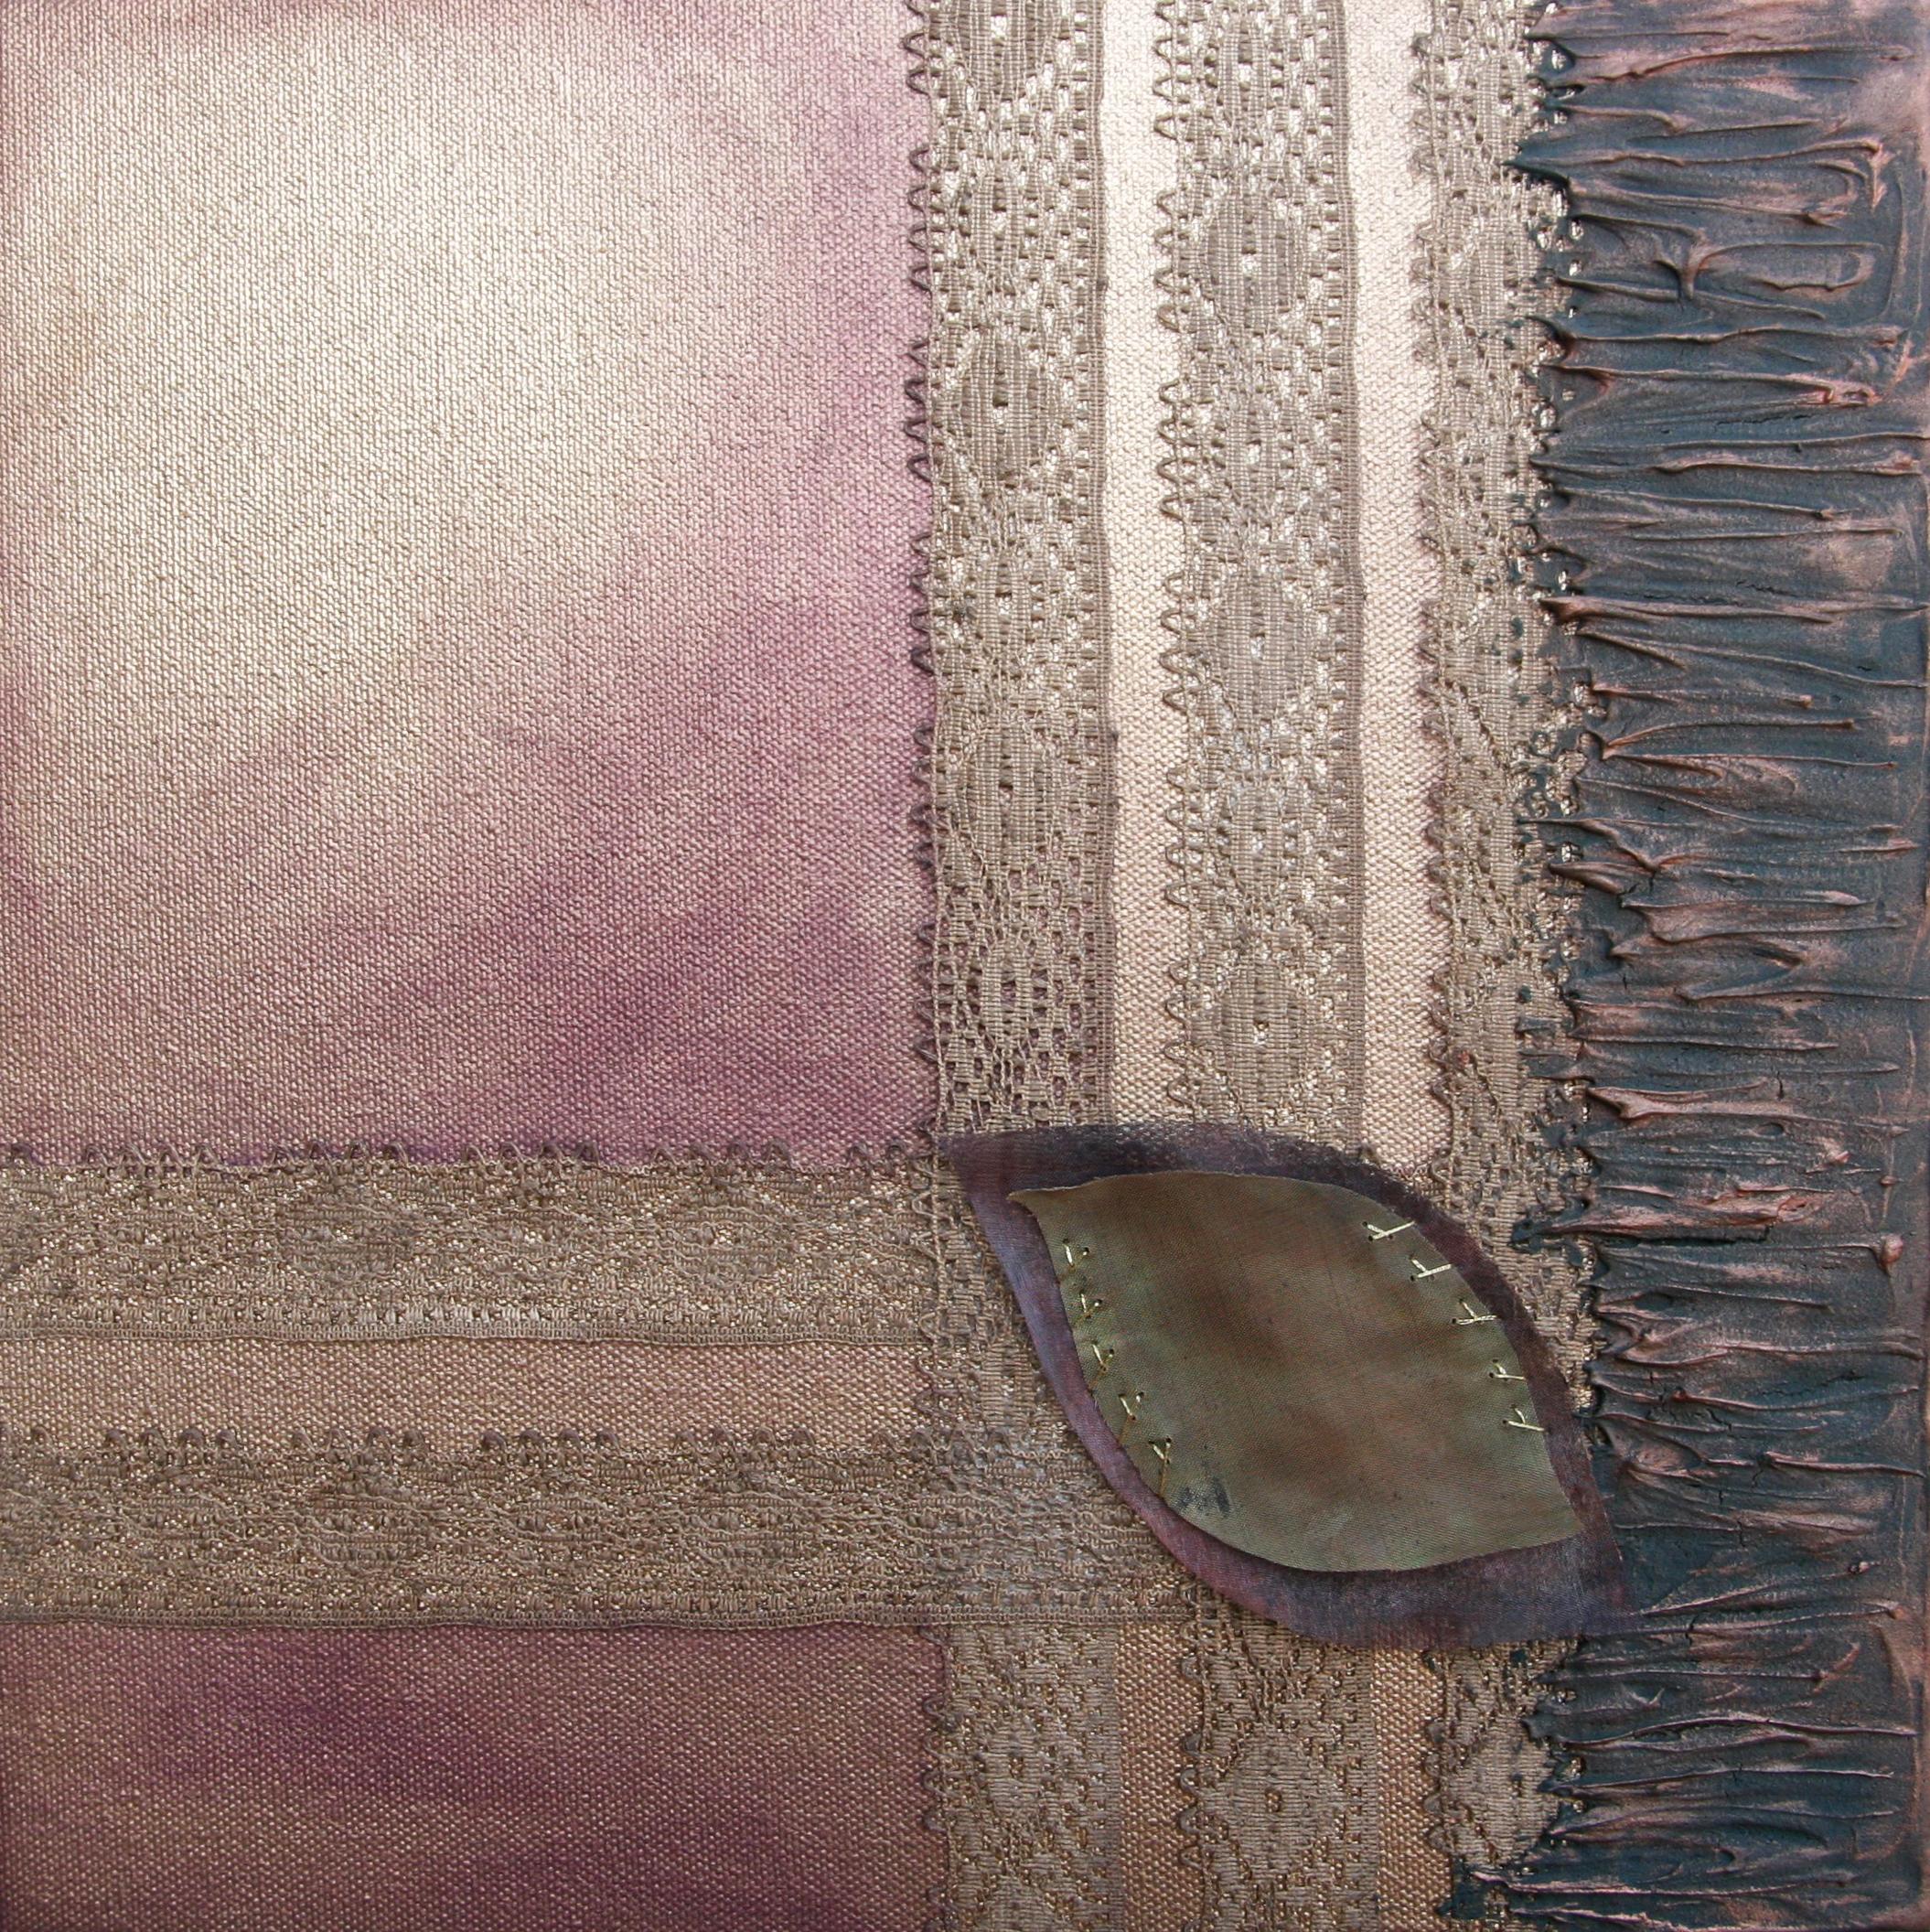 Rest   mixed media on canvas   12 x 12   $125